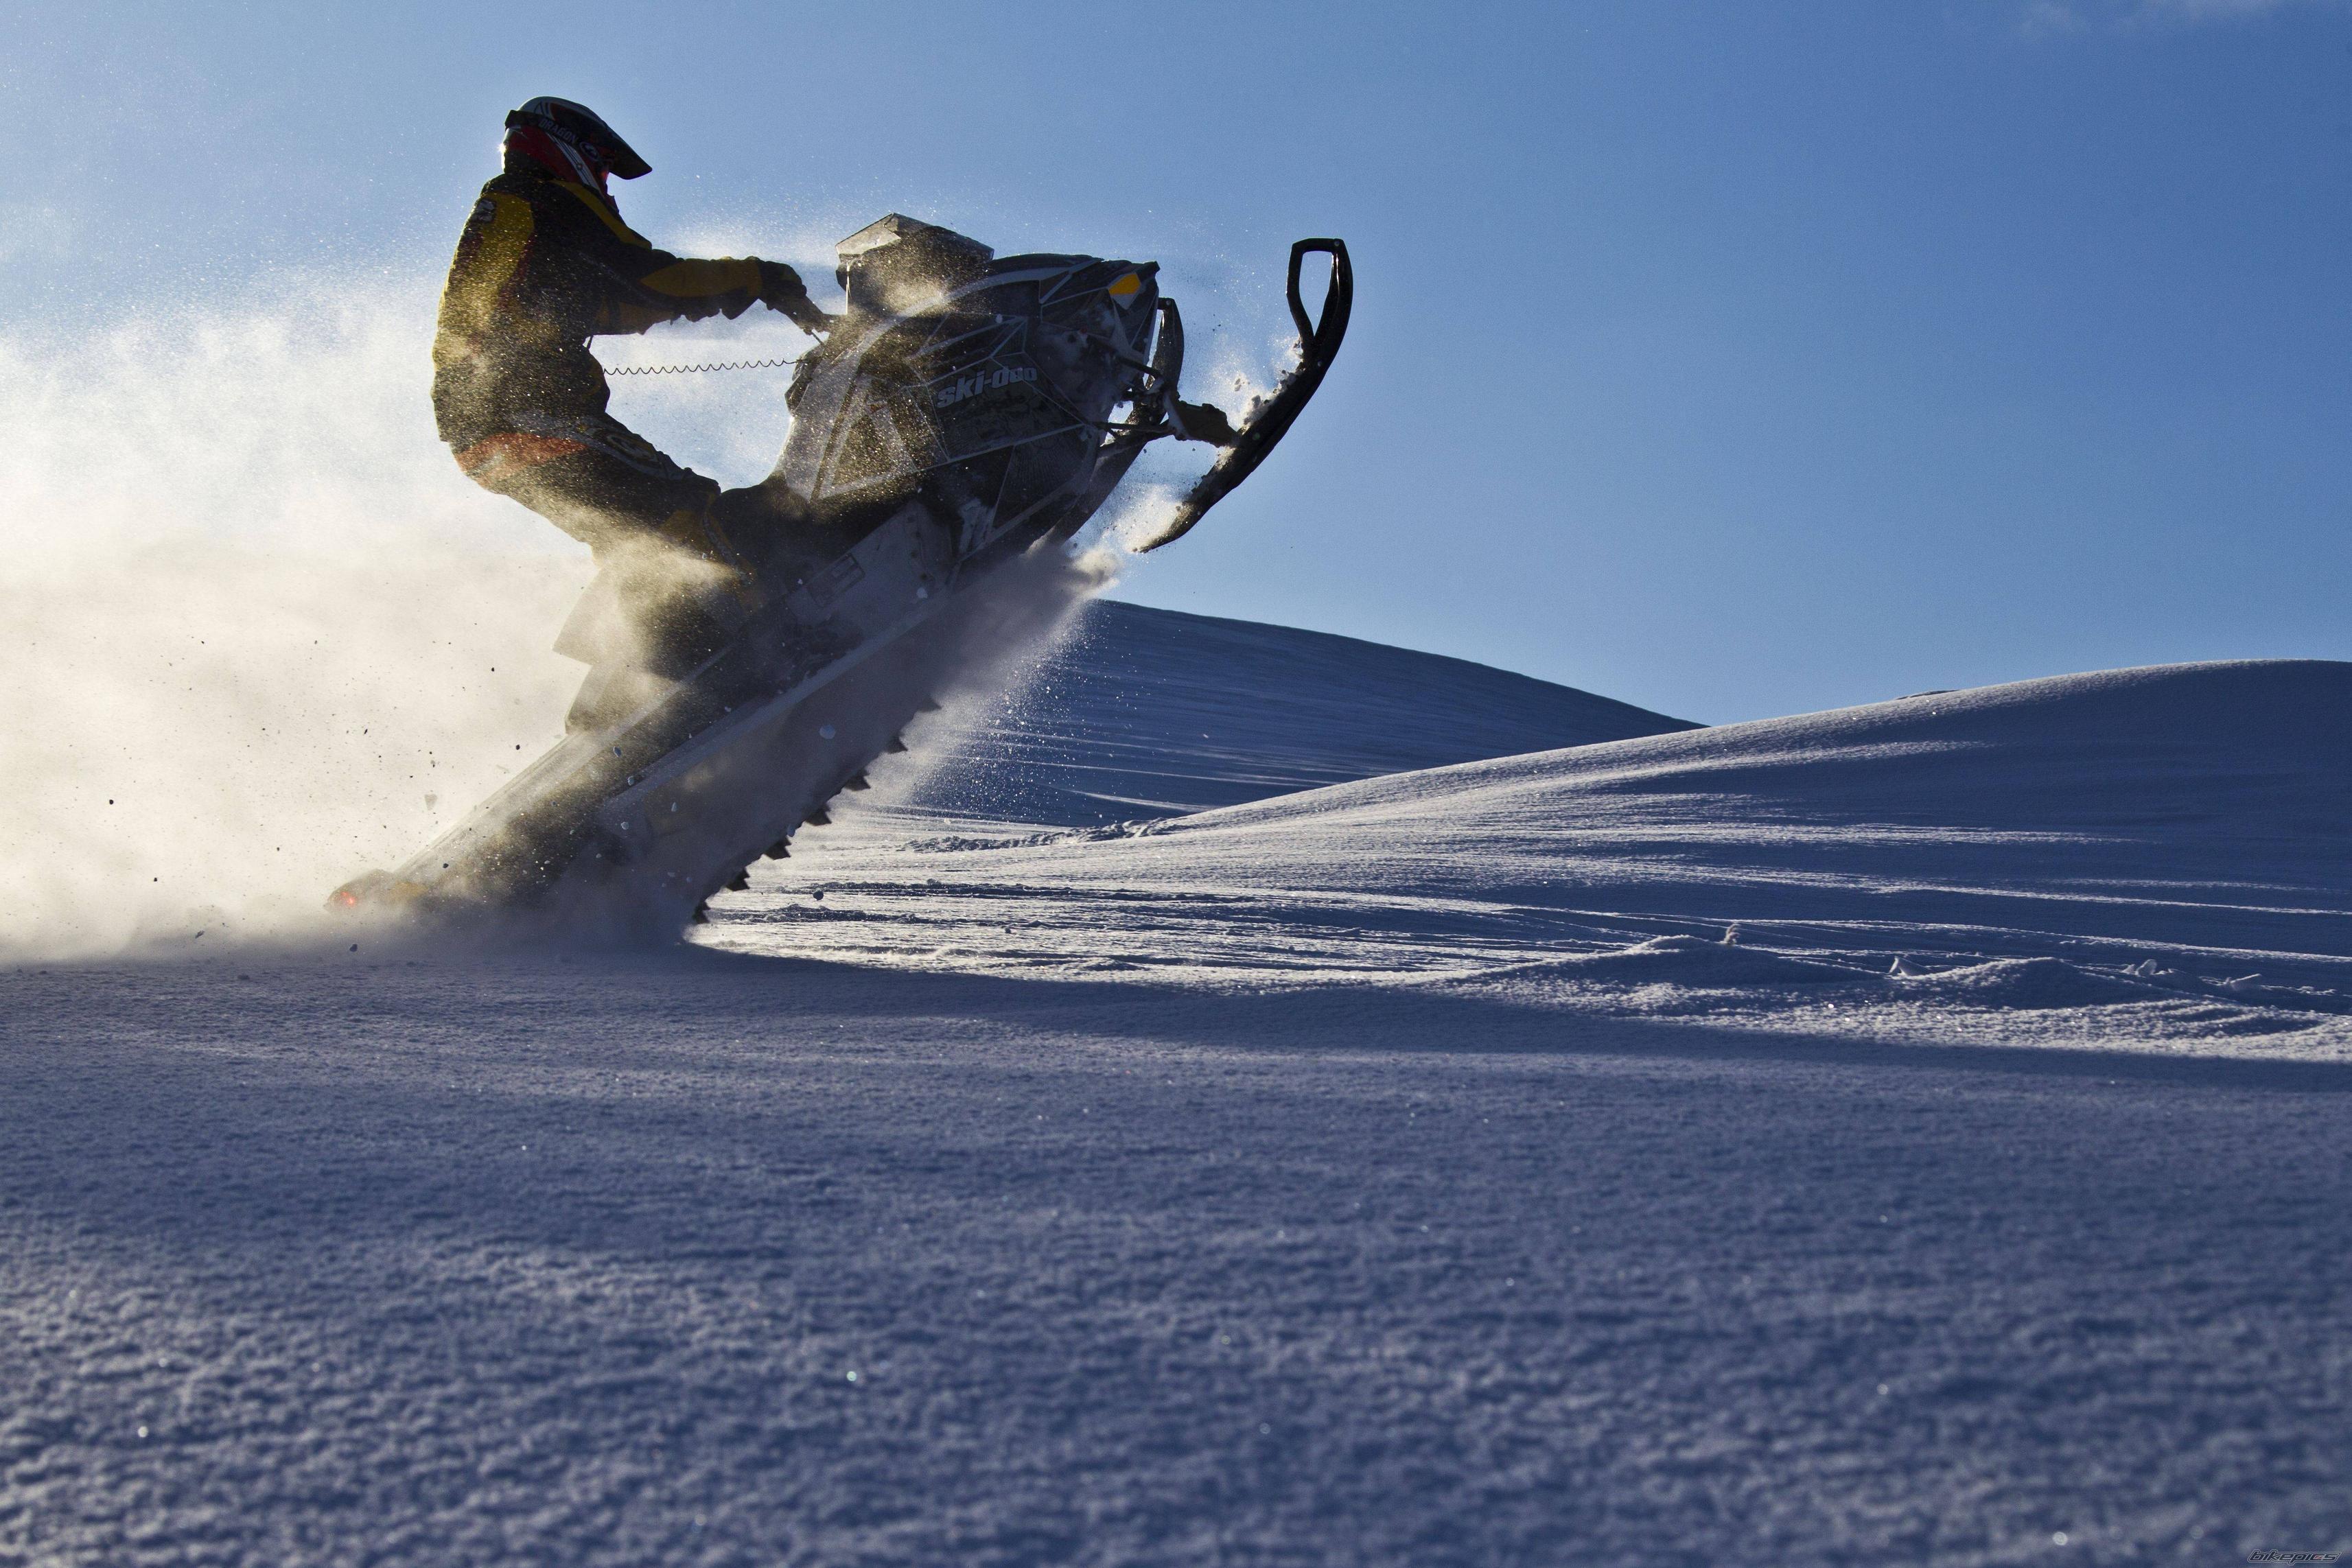 Ski Doo Wallpapers 3427x2285